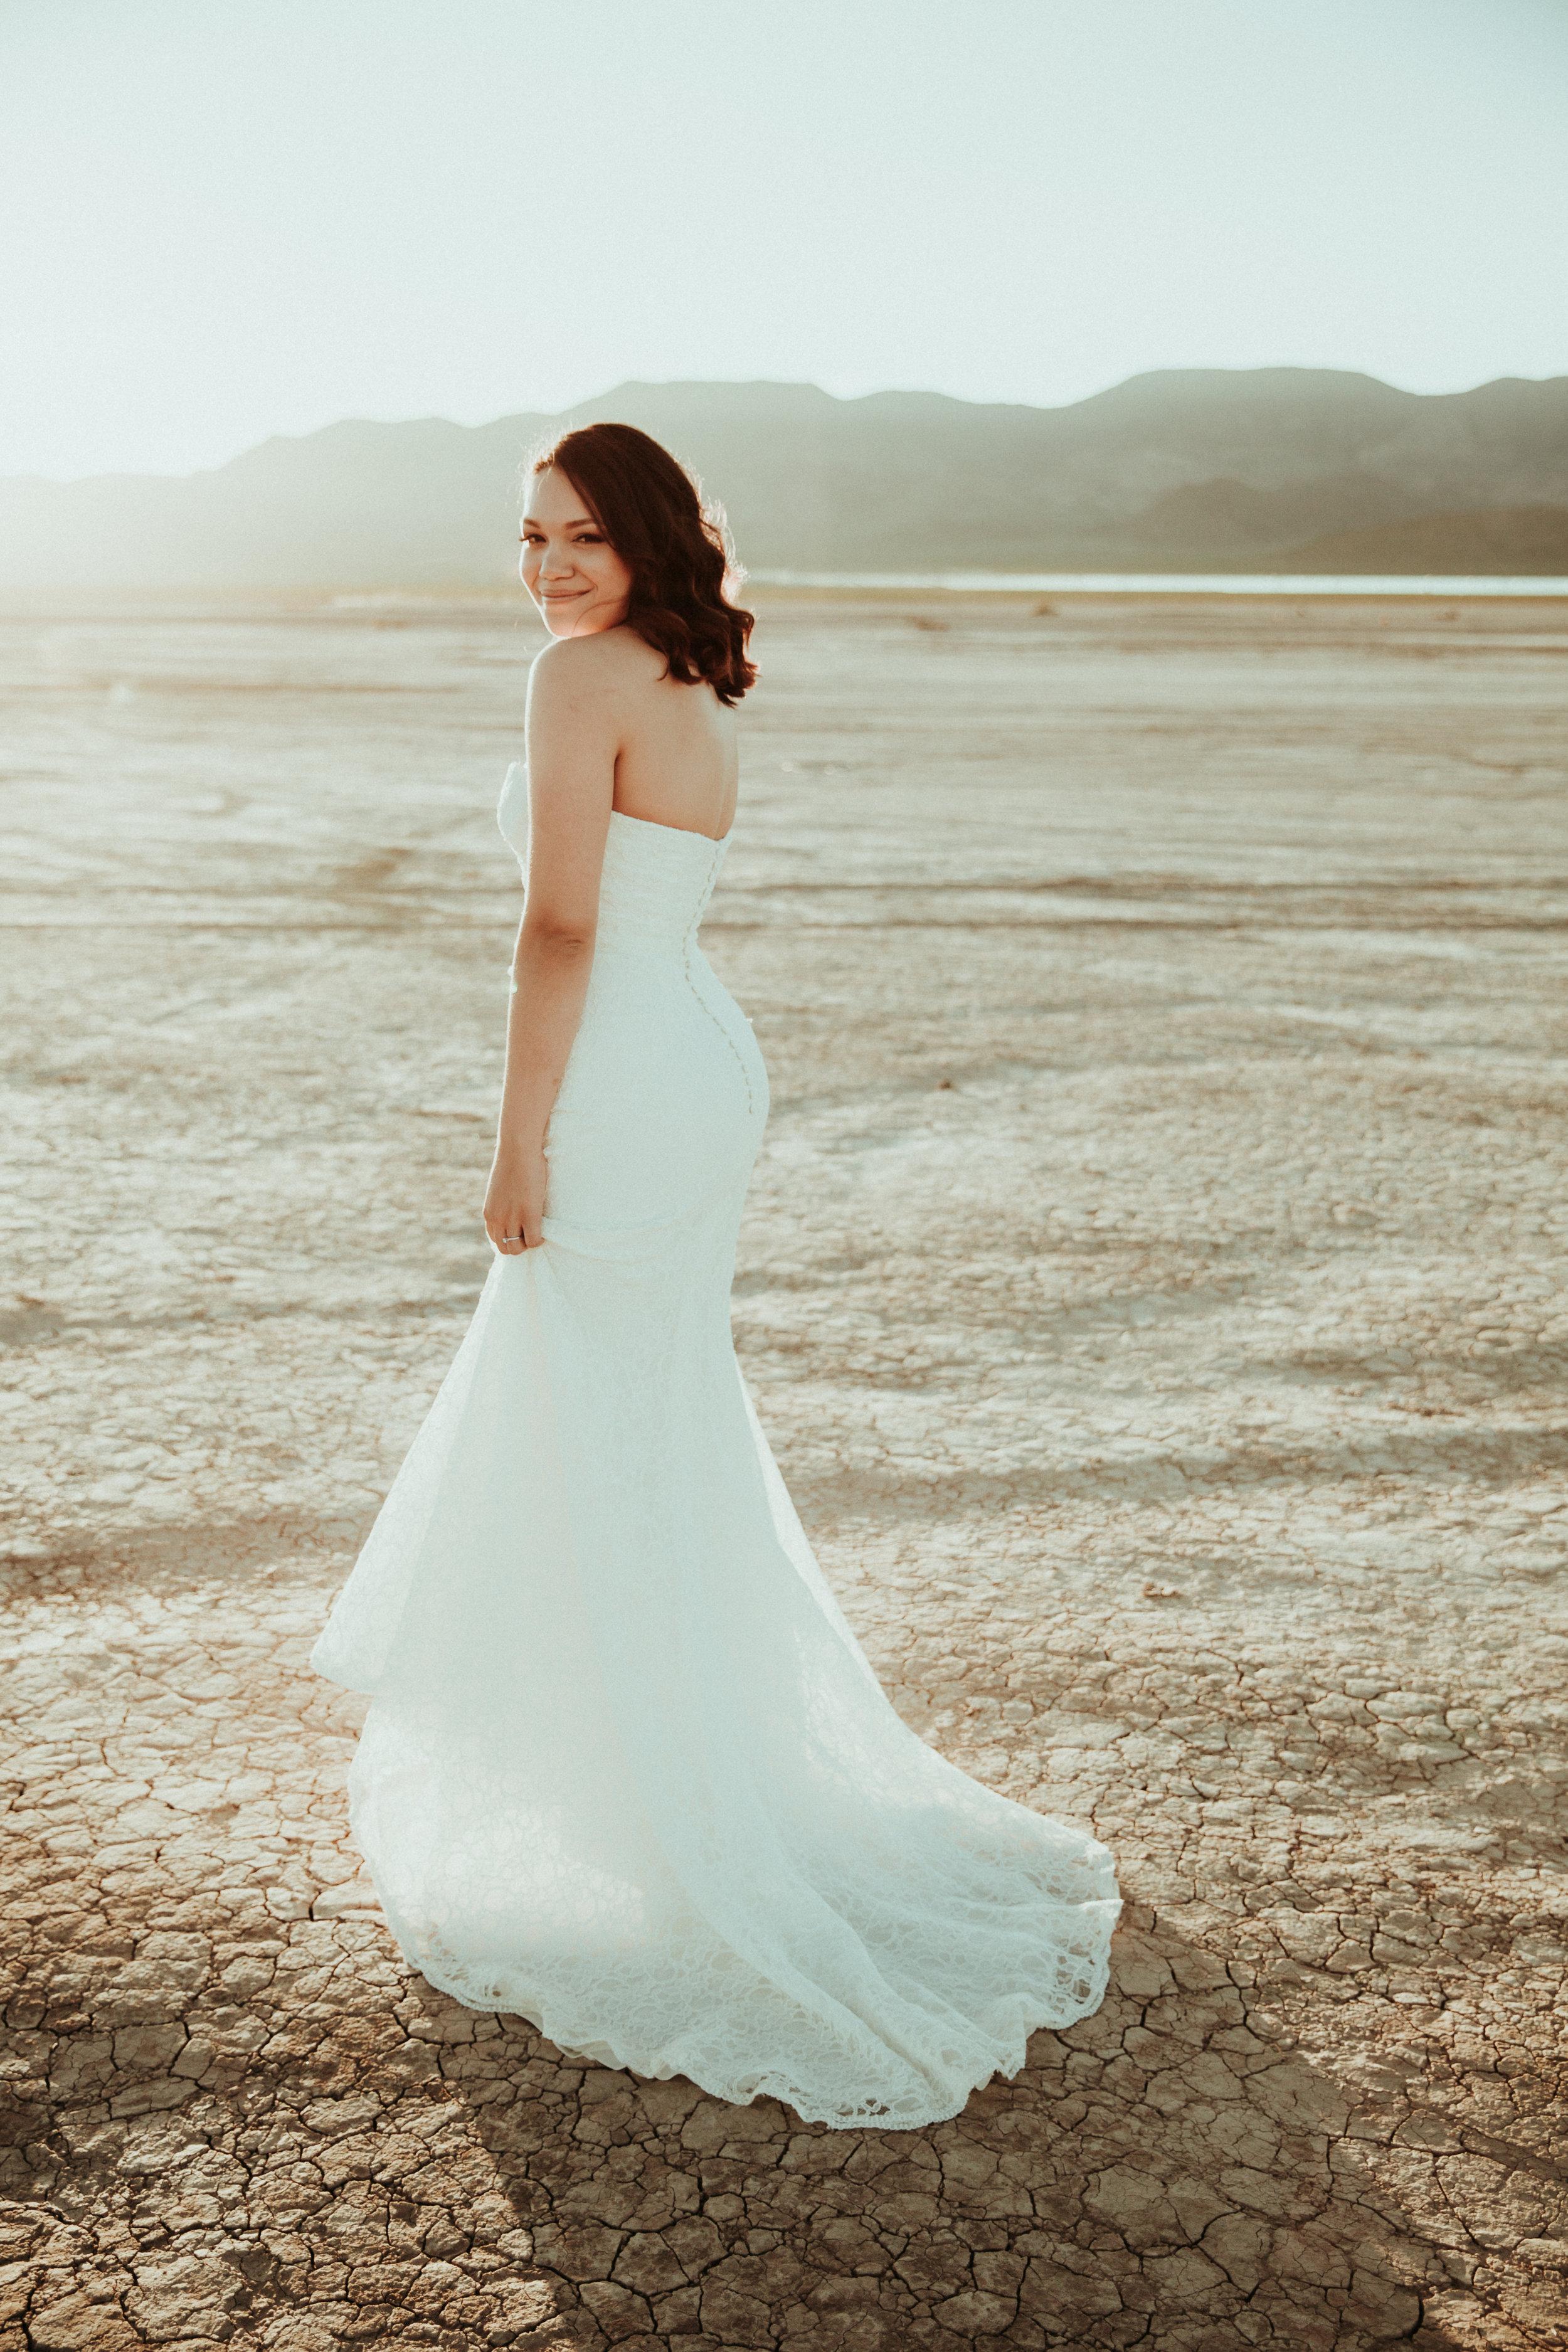 Jessica + Daniel - Seattle Wedding Photographer - Las Vegas Wedding - Henderson, NV - First Look - Bridal Portrait